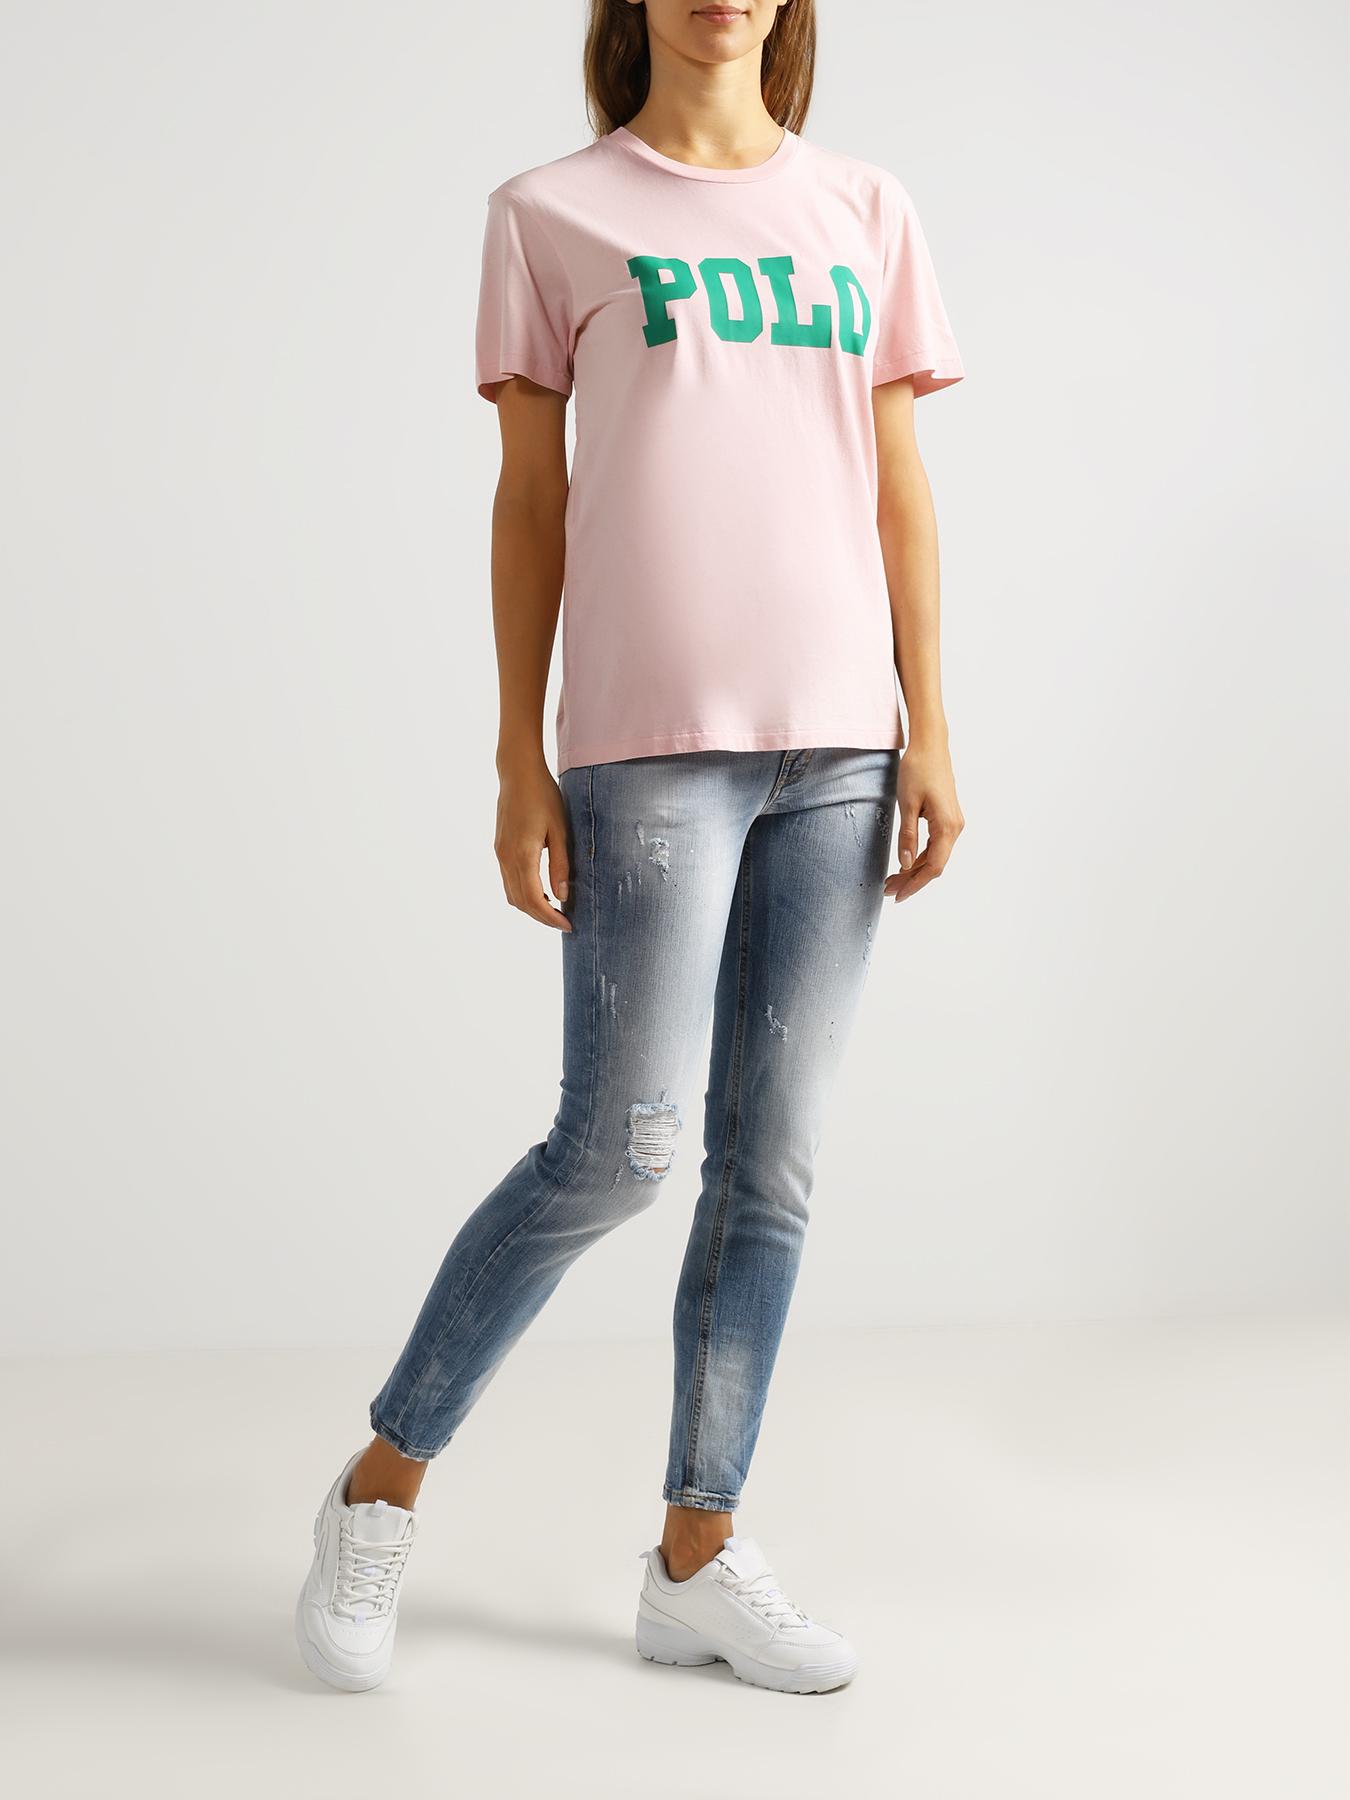 цена на Фуфайка Polo Ralph Lauren Женская футболка